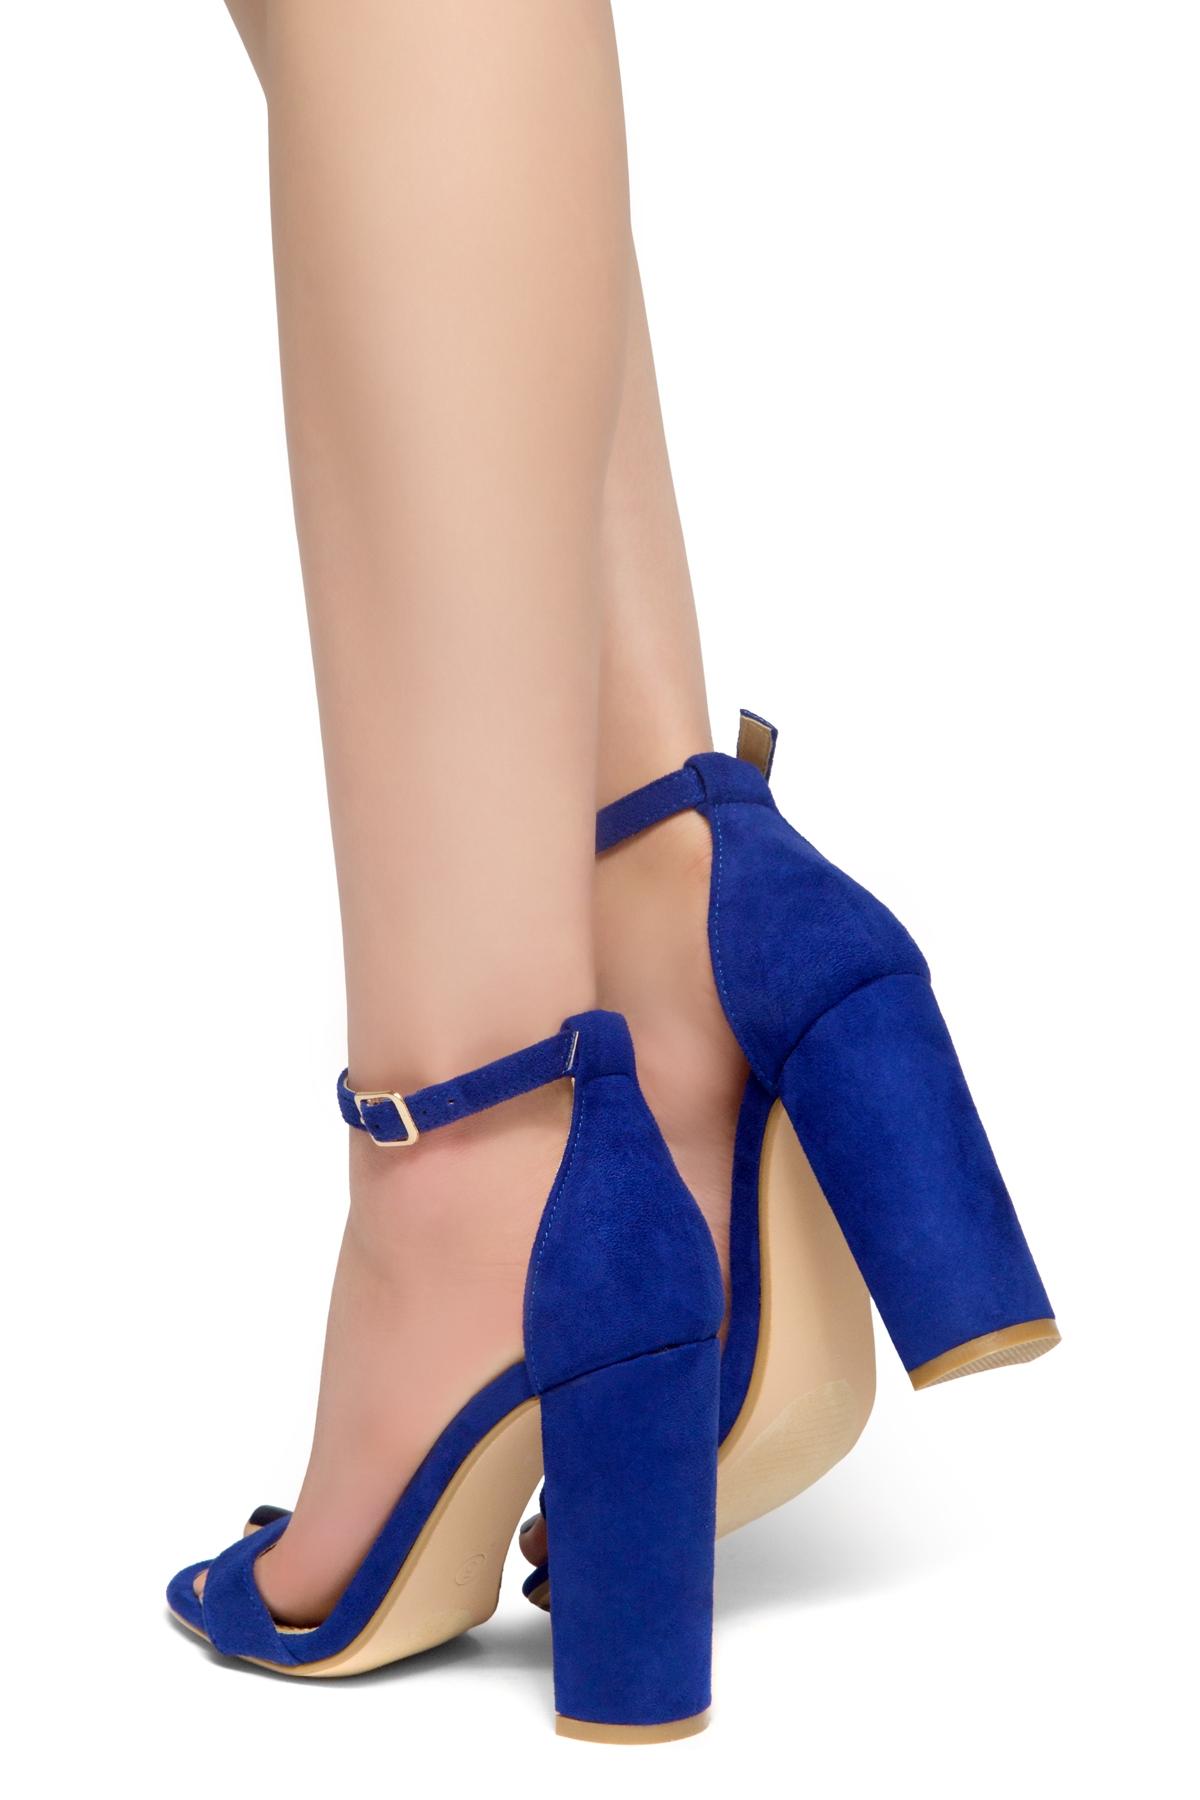 72663e9074154 Blue Chunky Heels - Js Heel